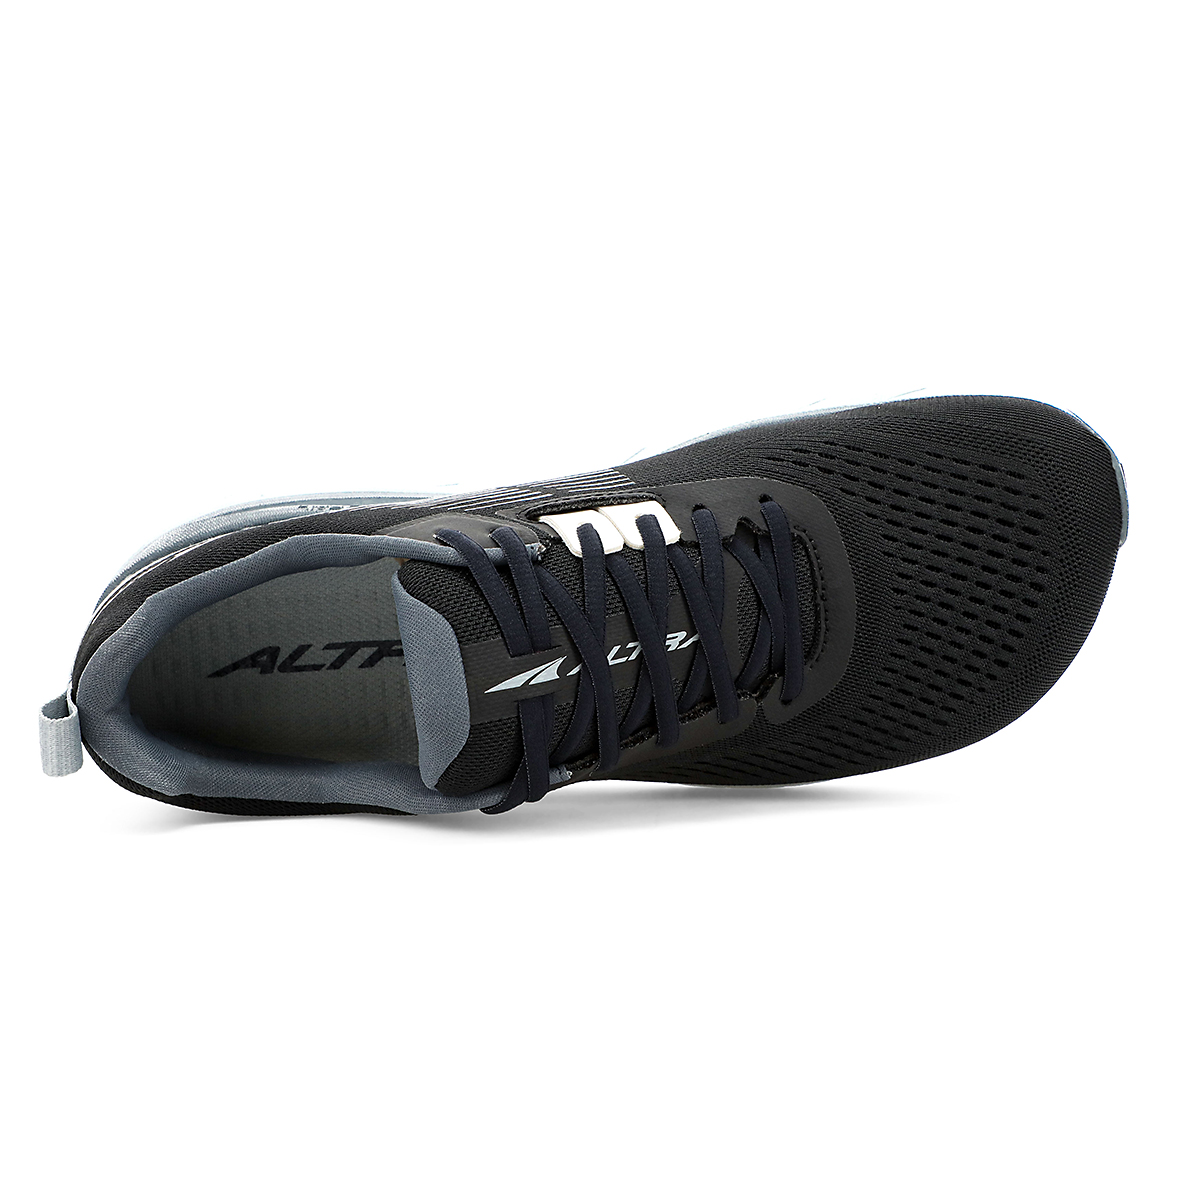 Men's Altra Provision 5 Running Shoe - Color: Black/Gray - Size: 8 - Width: Regular, Black/Gray, large, image 3